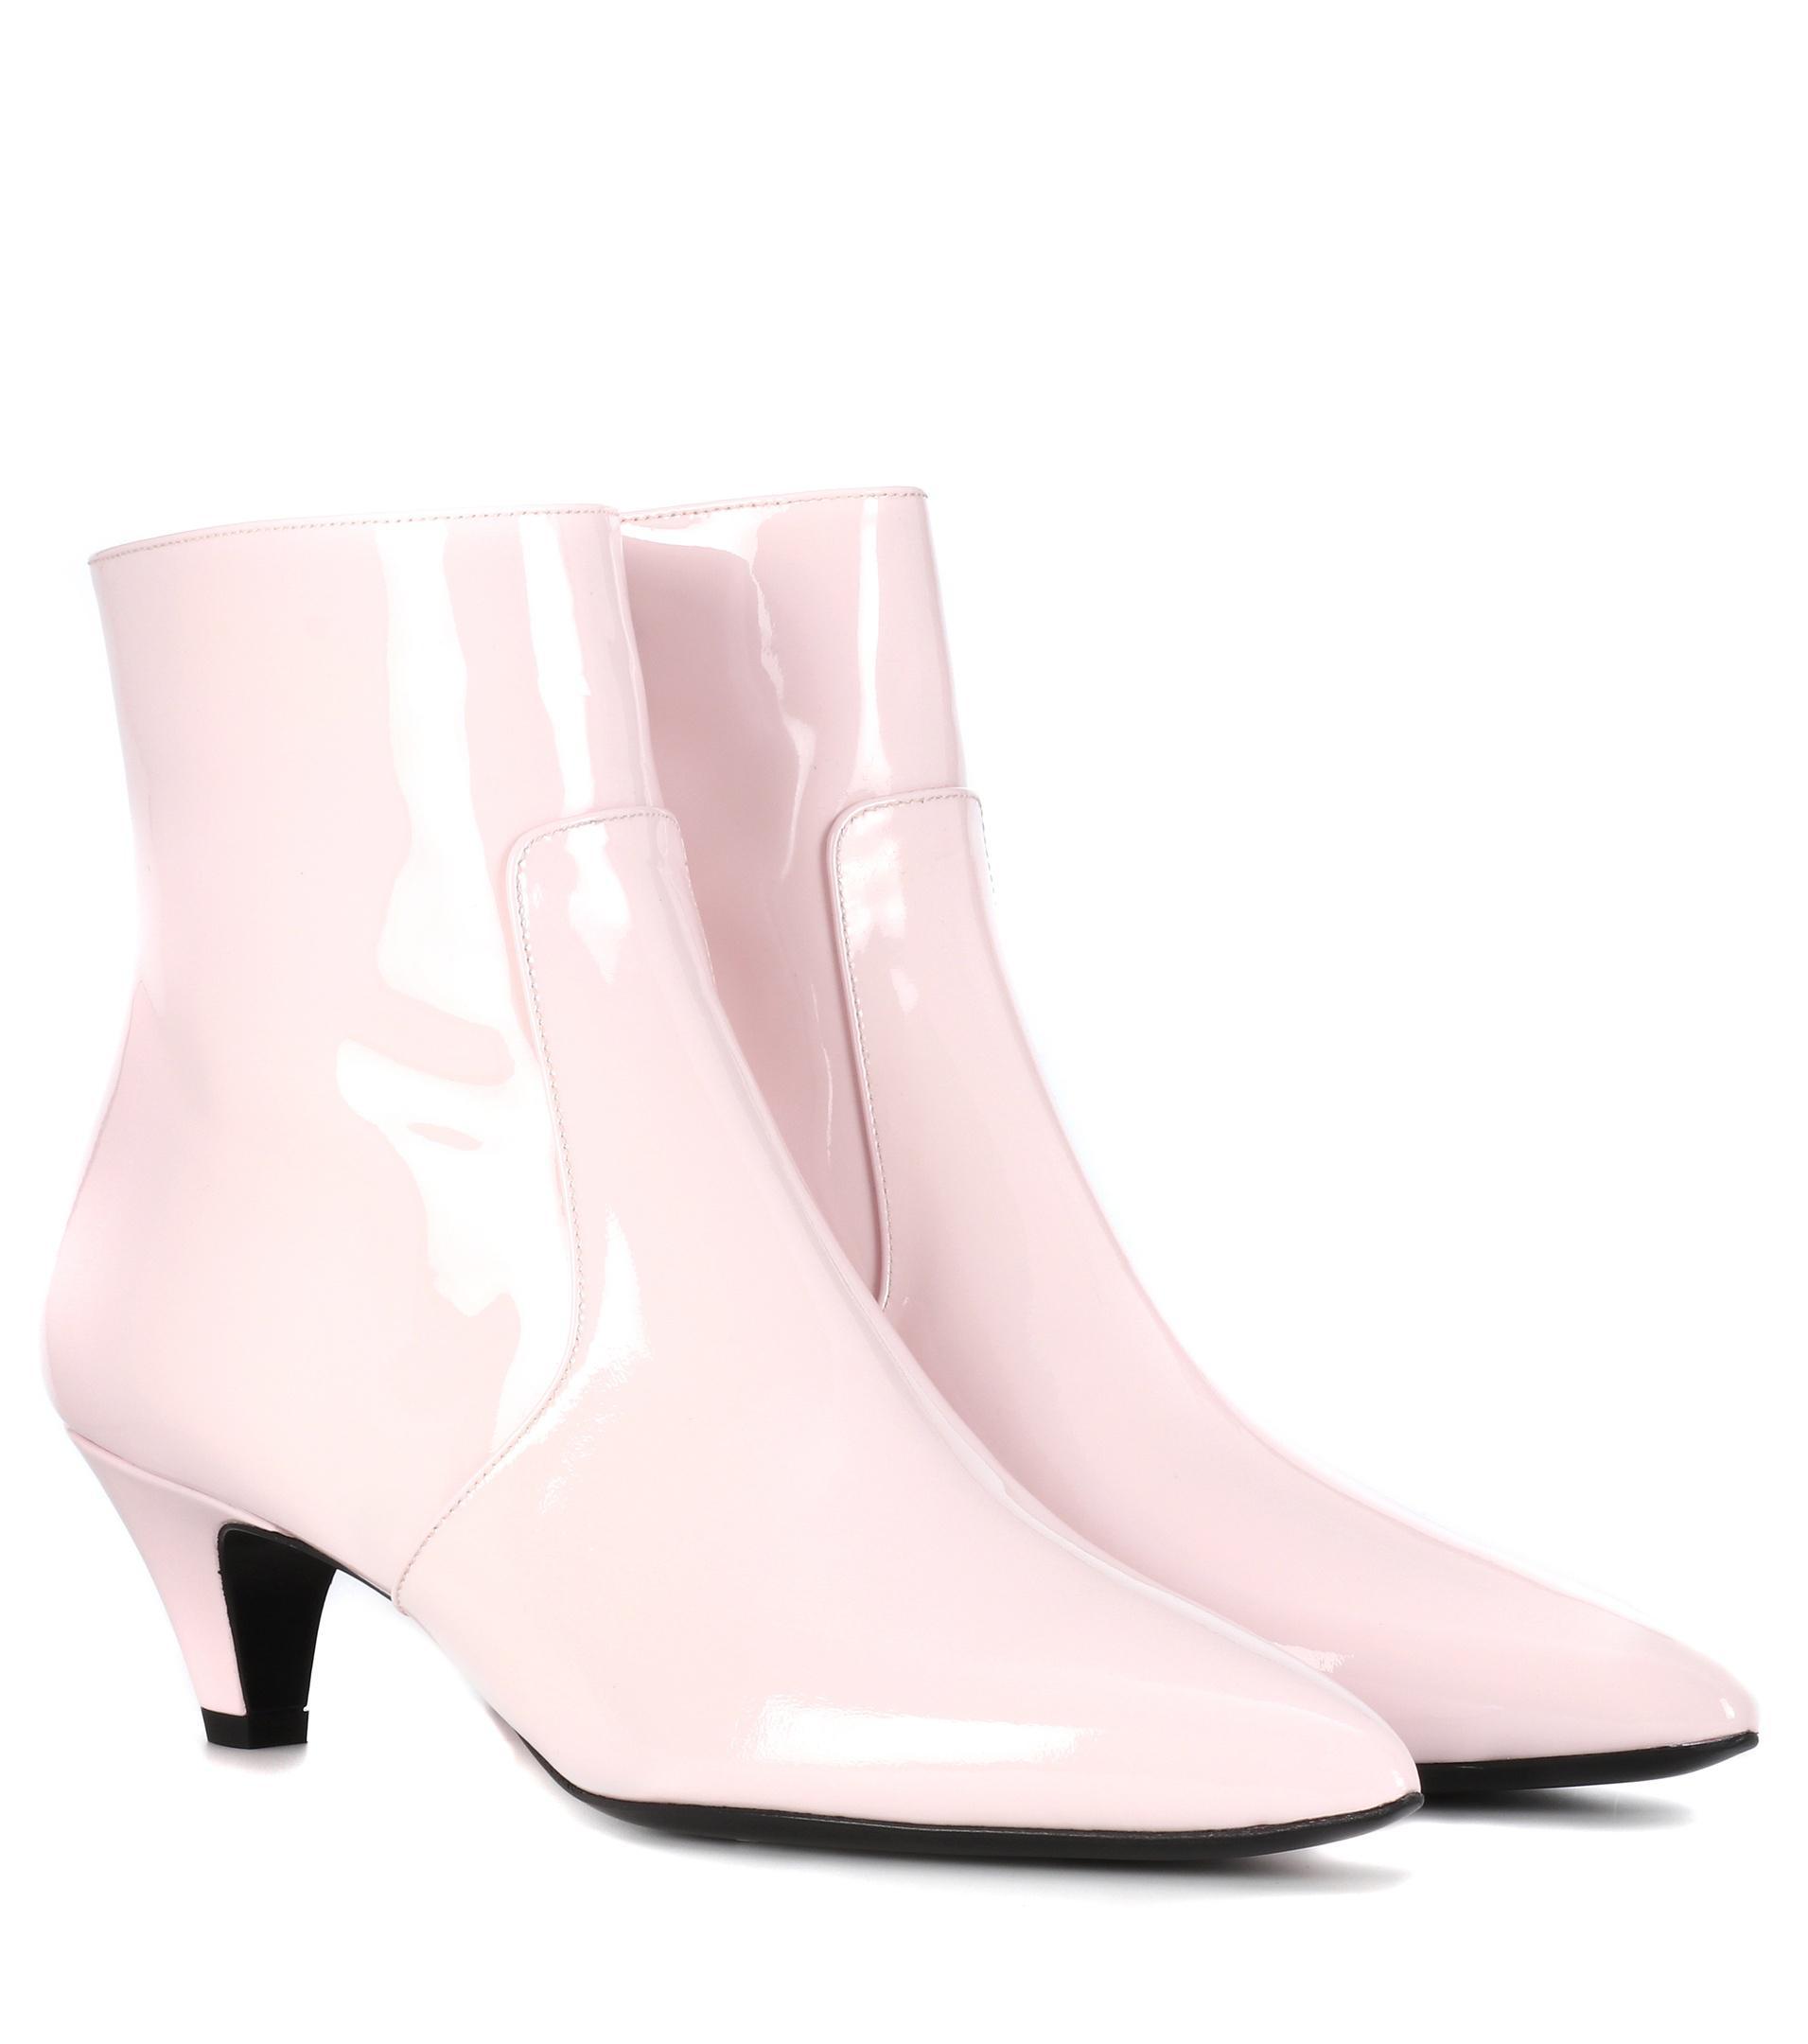 Calvin Klein 205W39NYC Pink Patent Kat Boots GcixJS7C